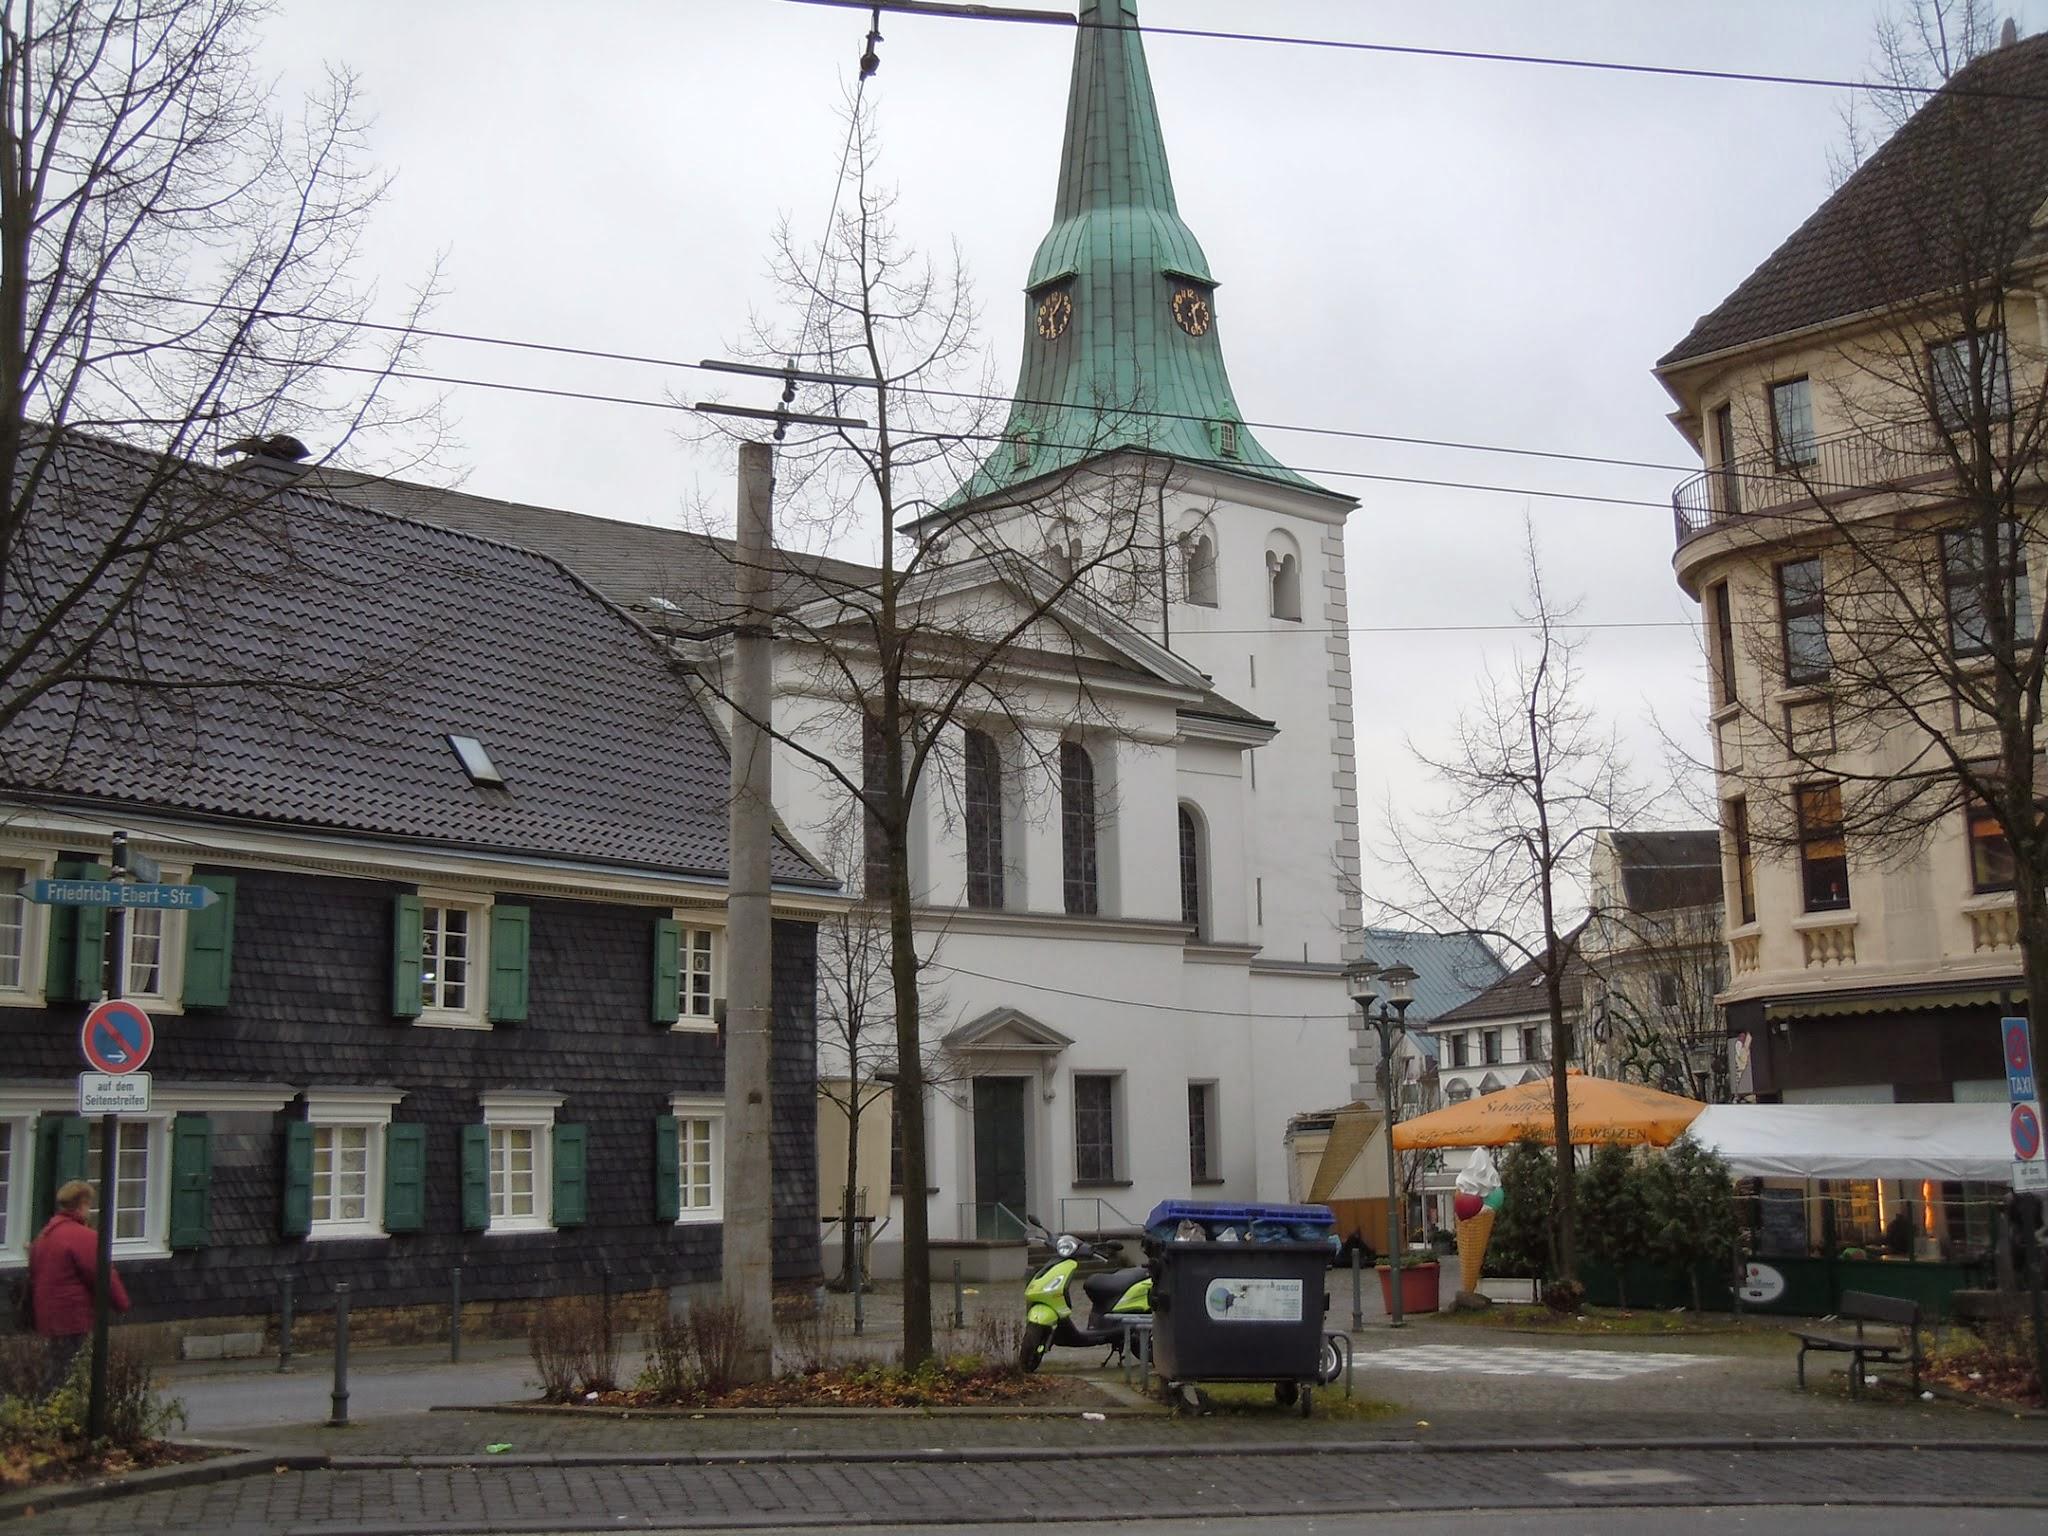 File:Solingen, Germany - panoramio.jpg - Wikimedia Commons